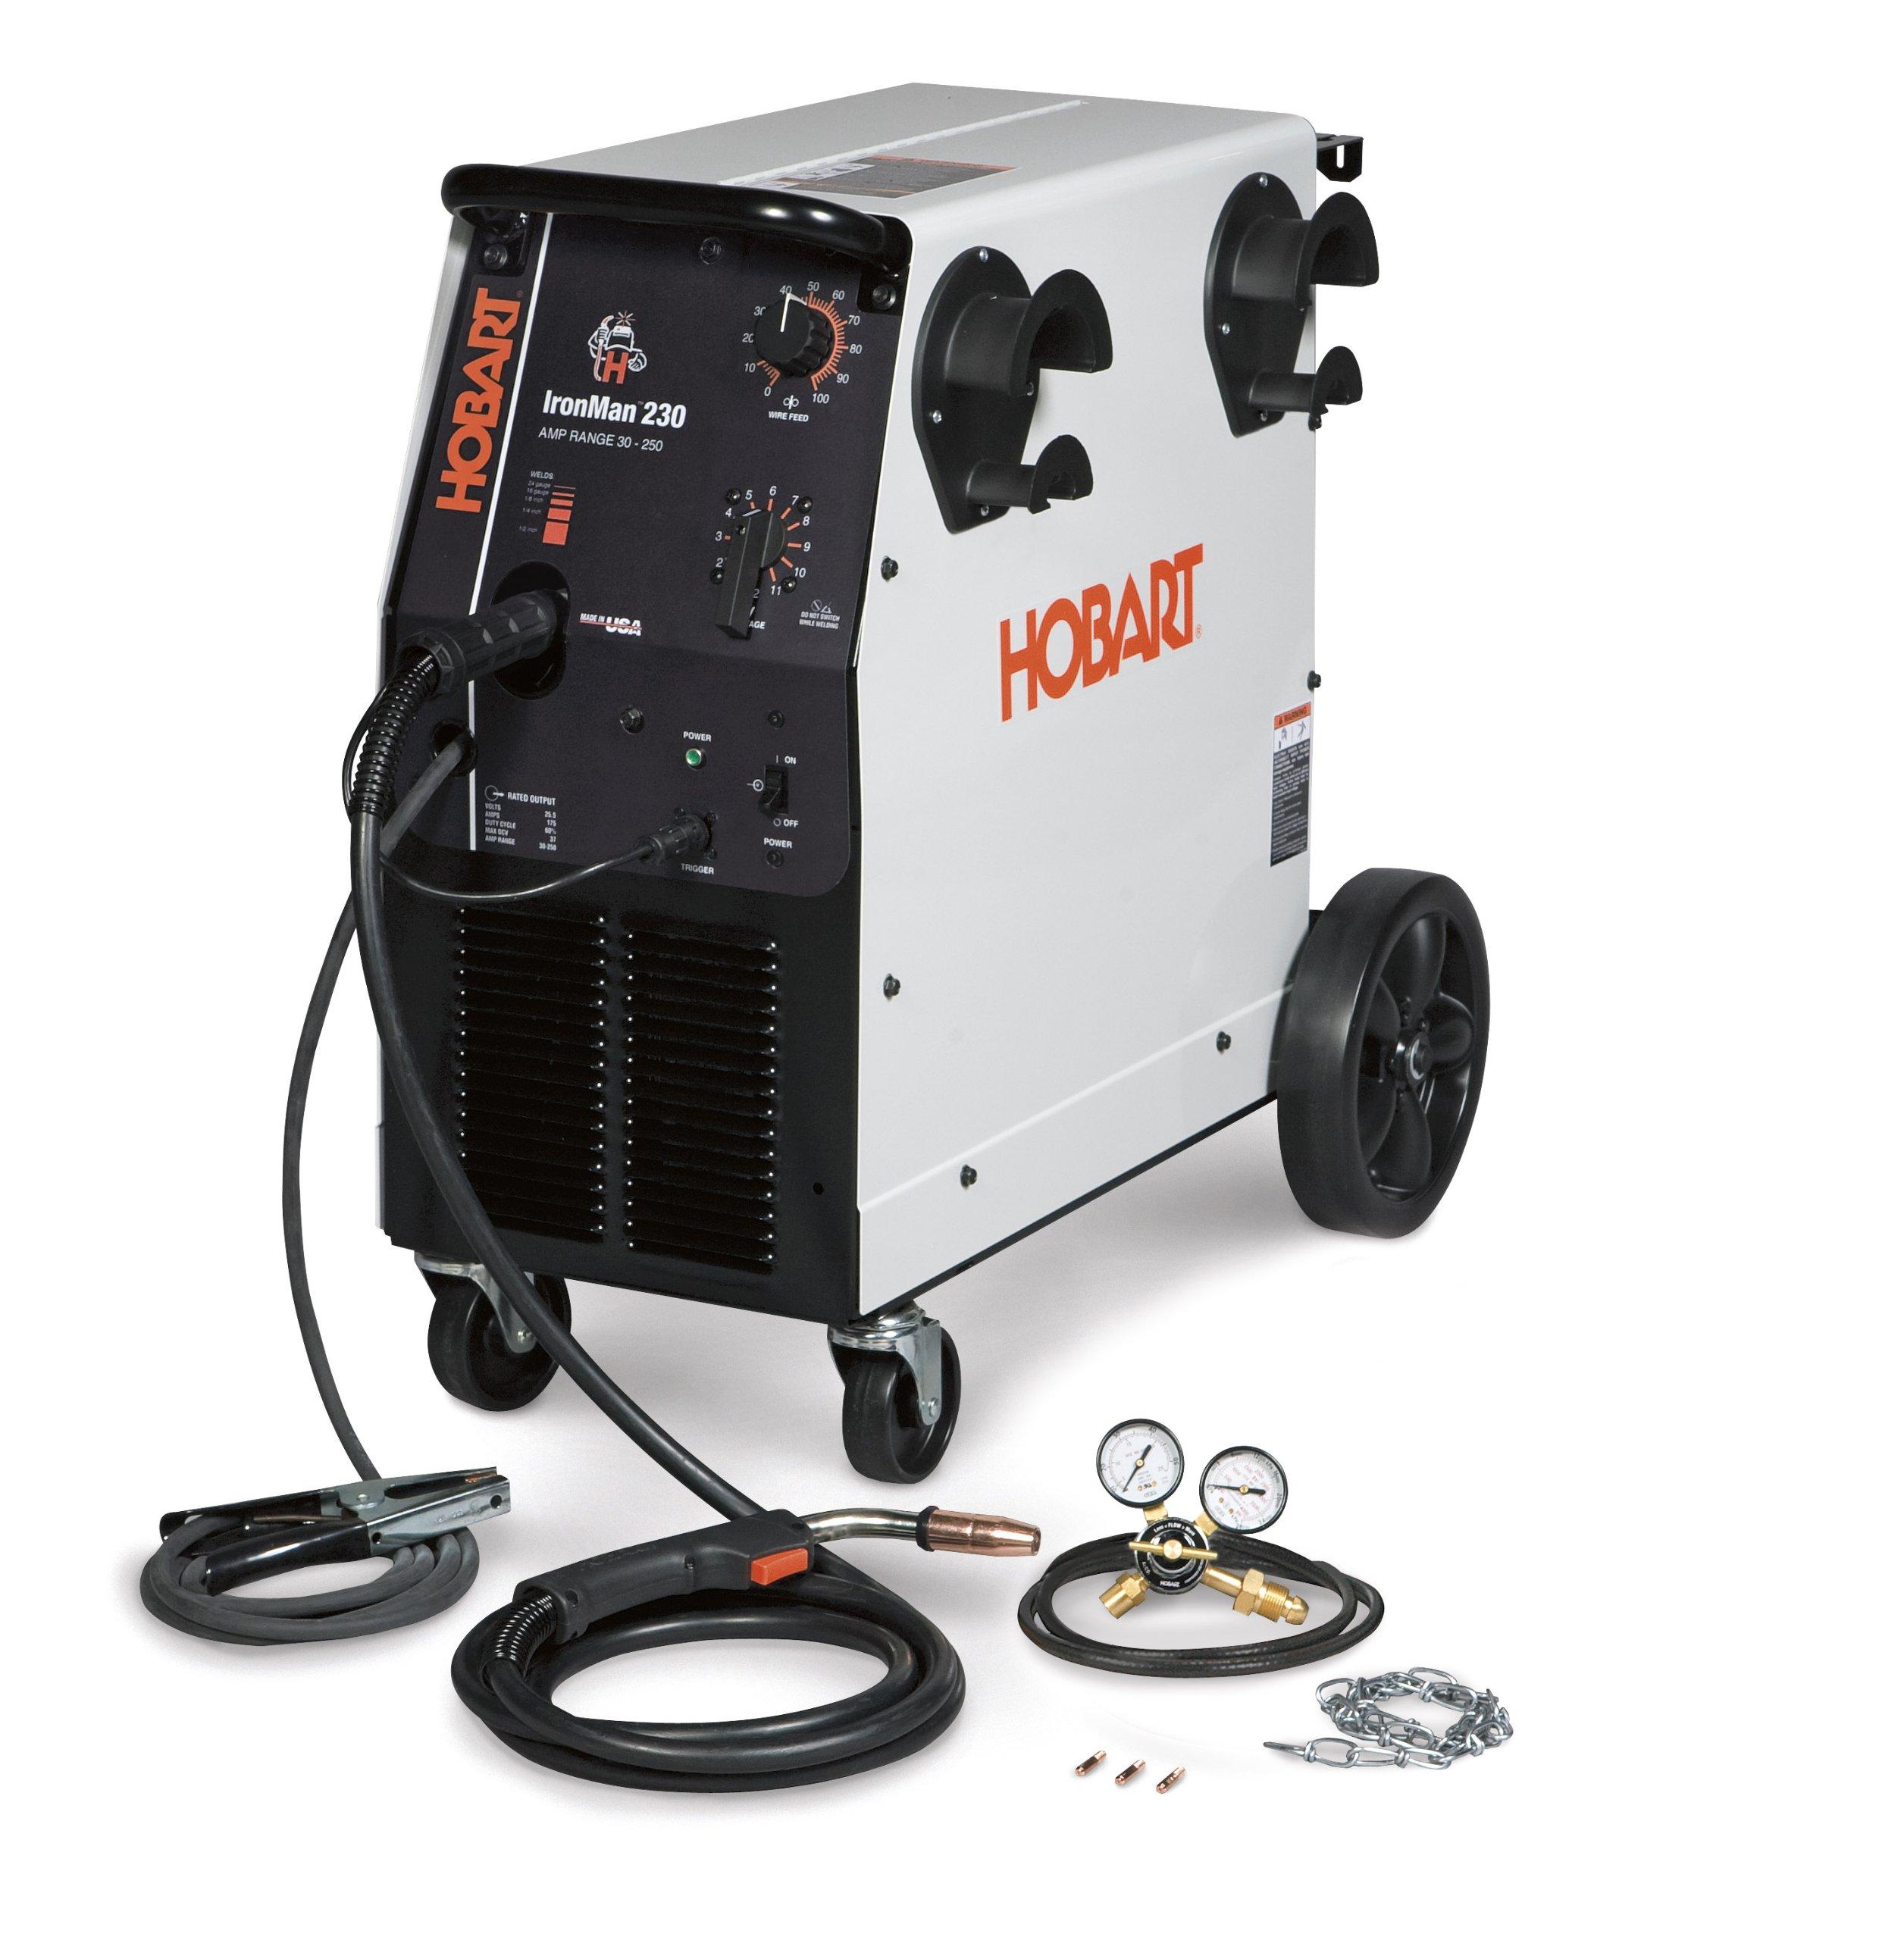 Hobart 500536 Ironman 230 MIG Welder With Wheel Kit & Cylinder Rack